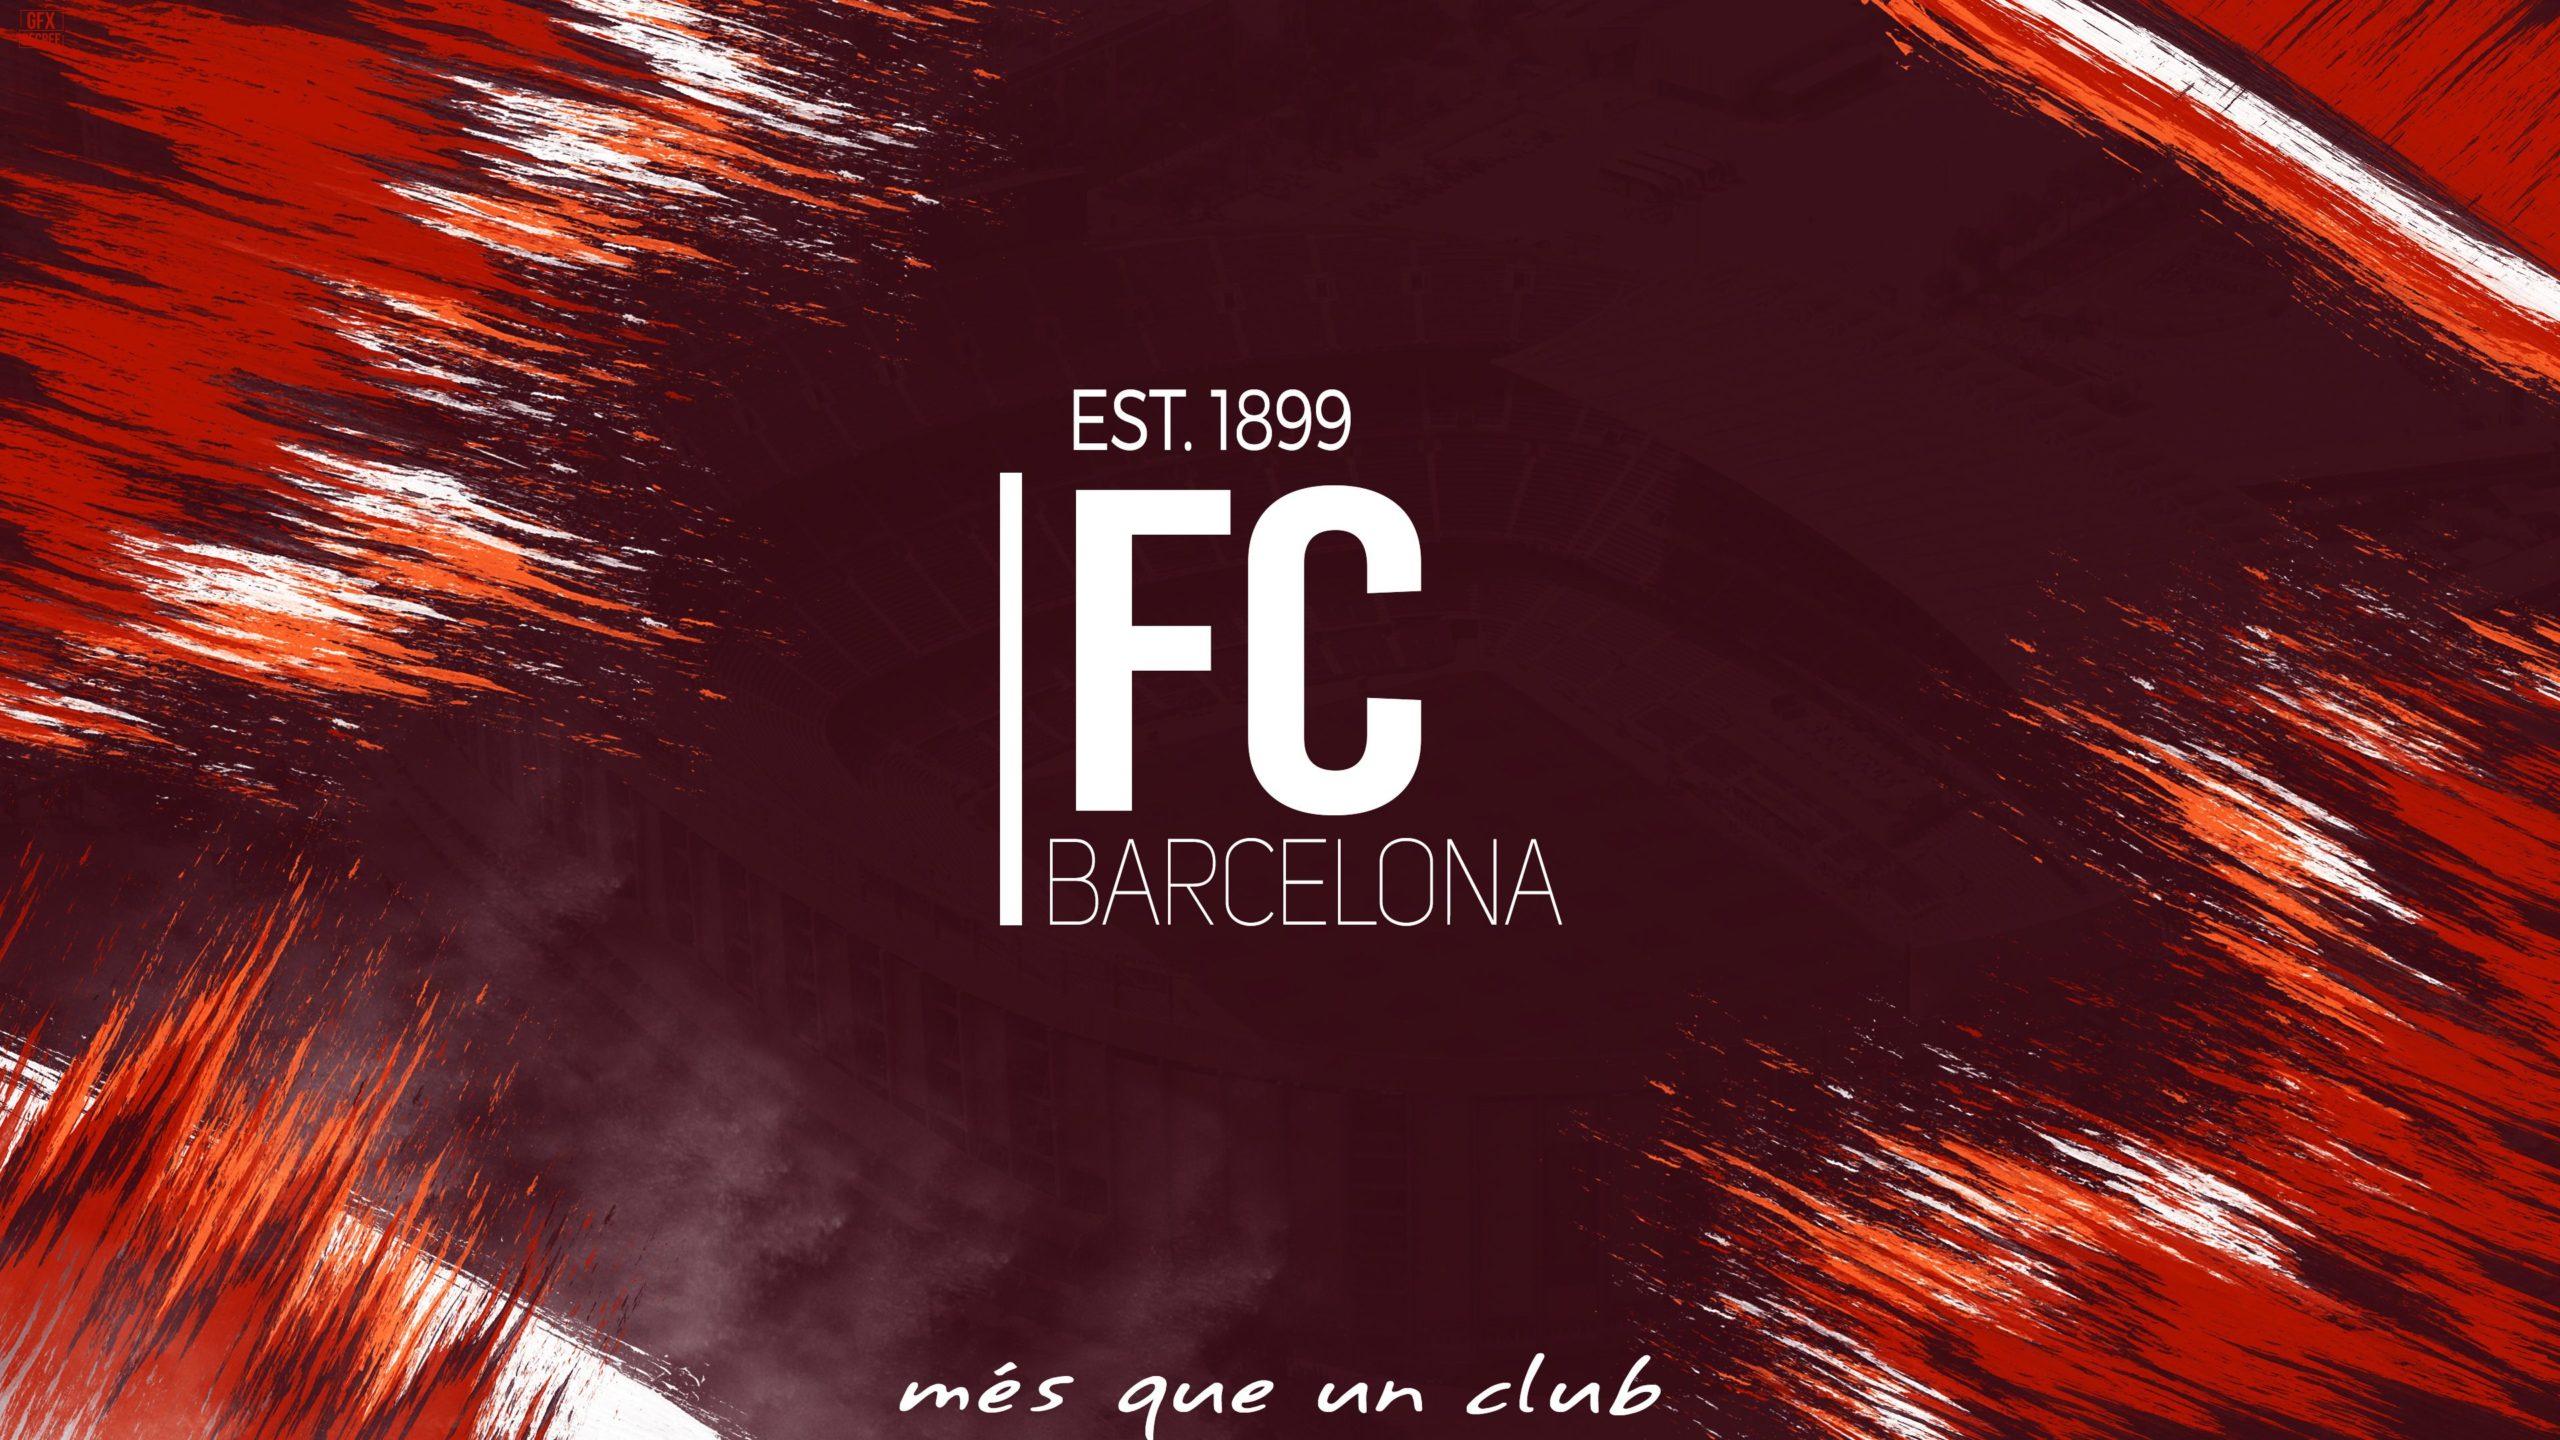 fc barcelona team wallpaper